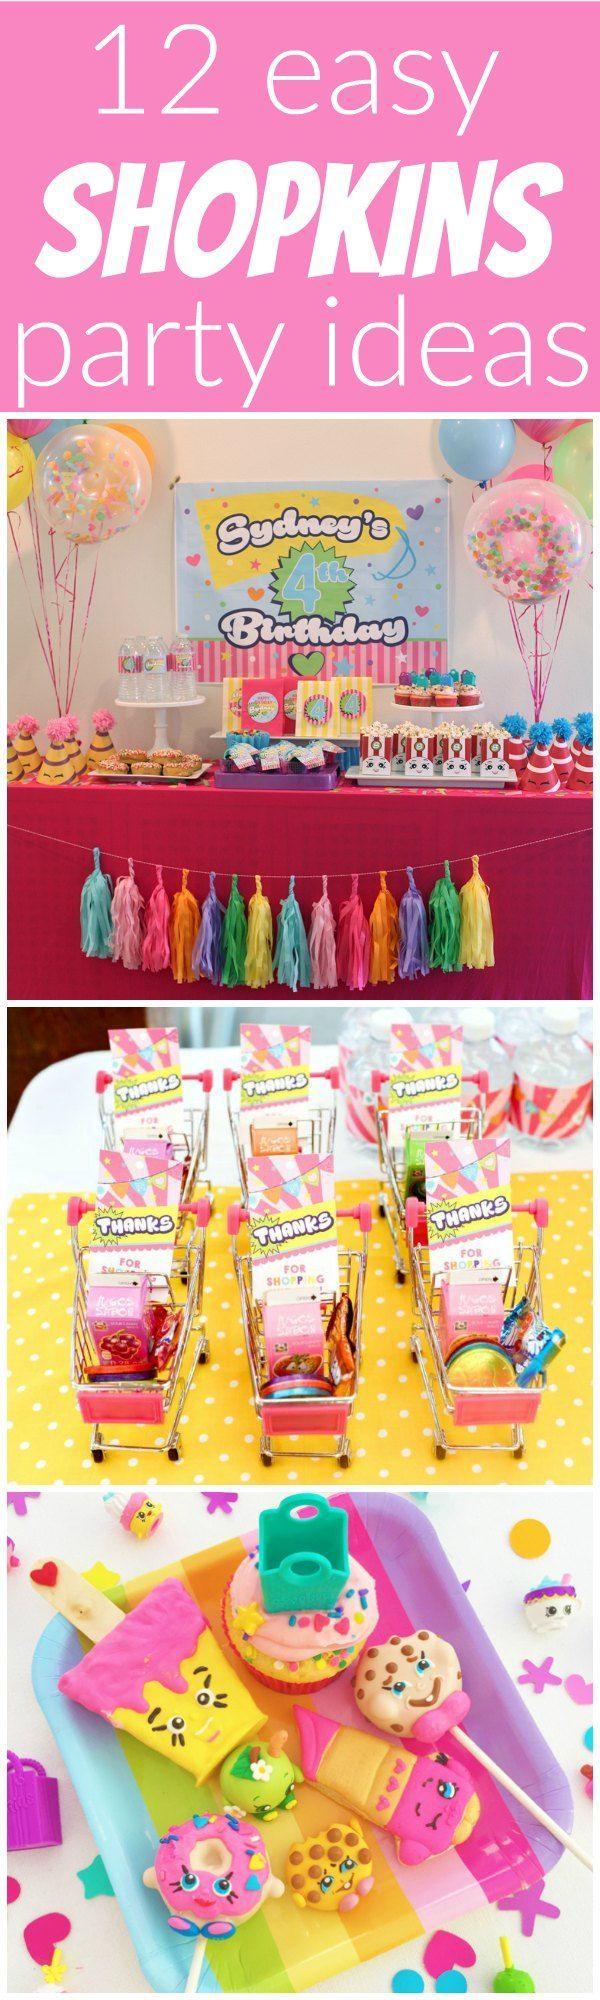 12 Easy Shopkins Party Ideas